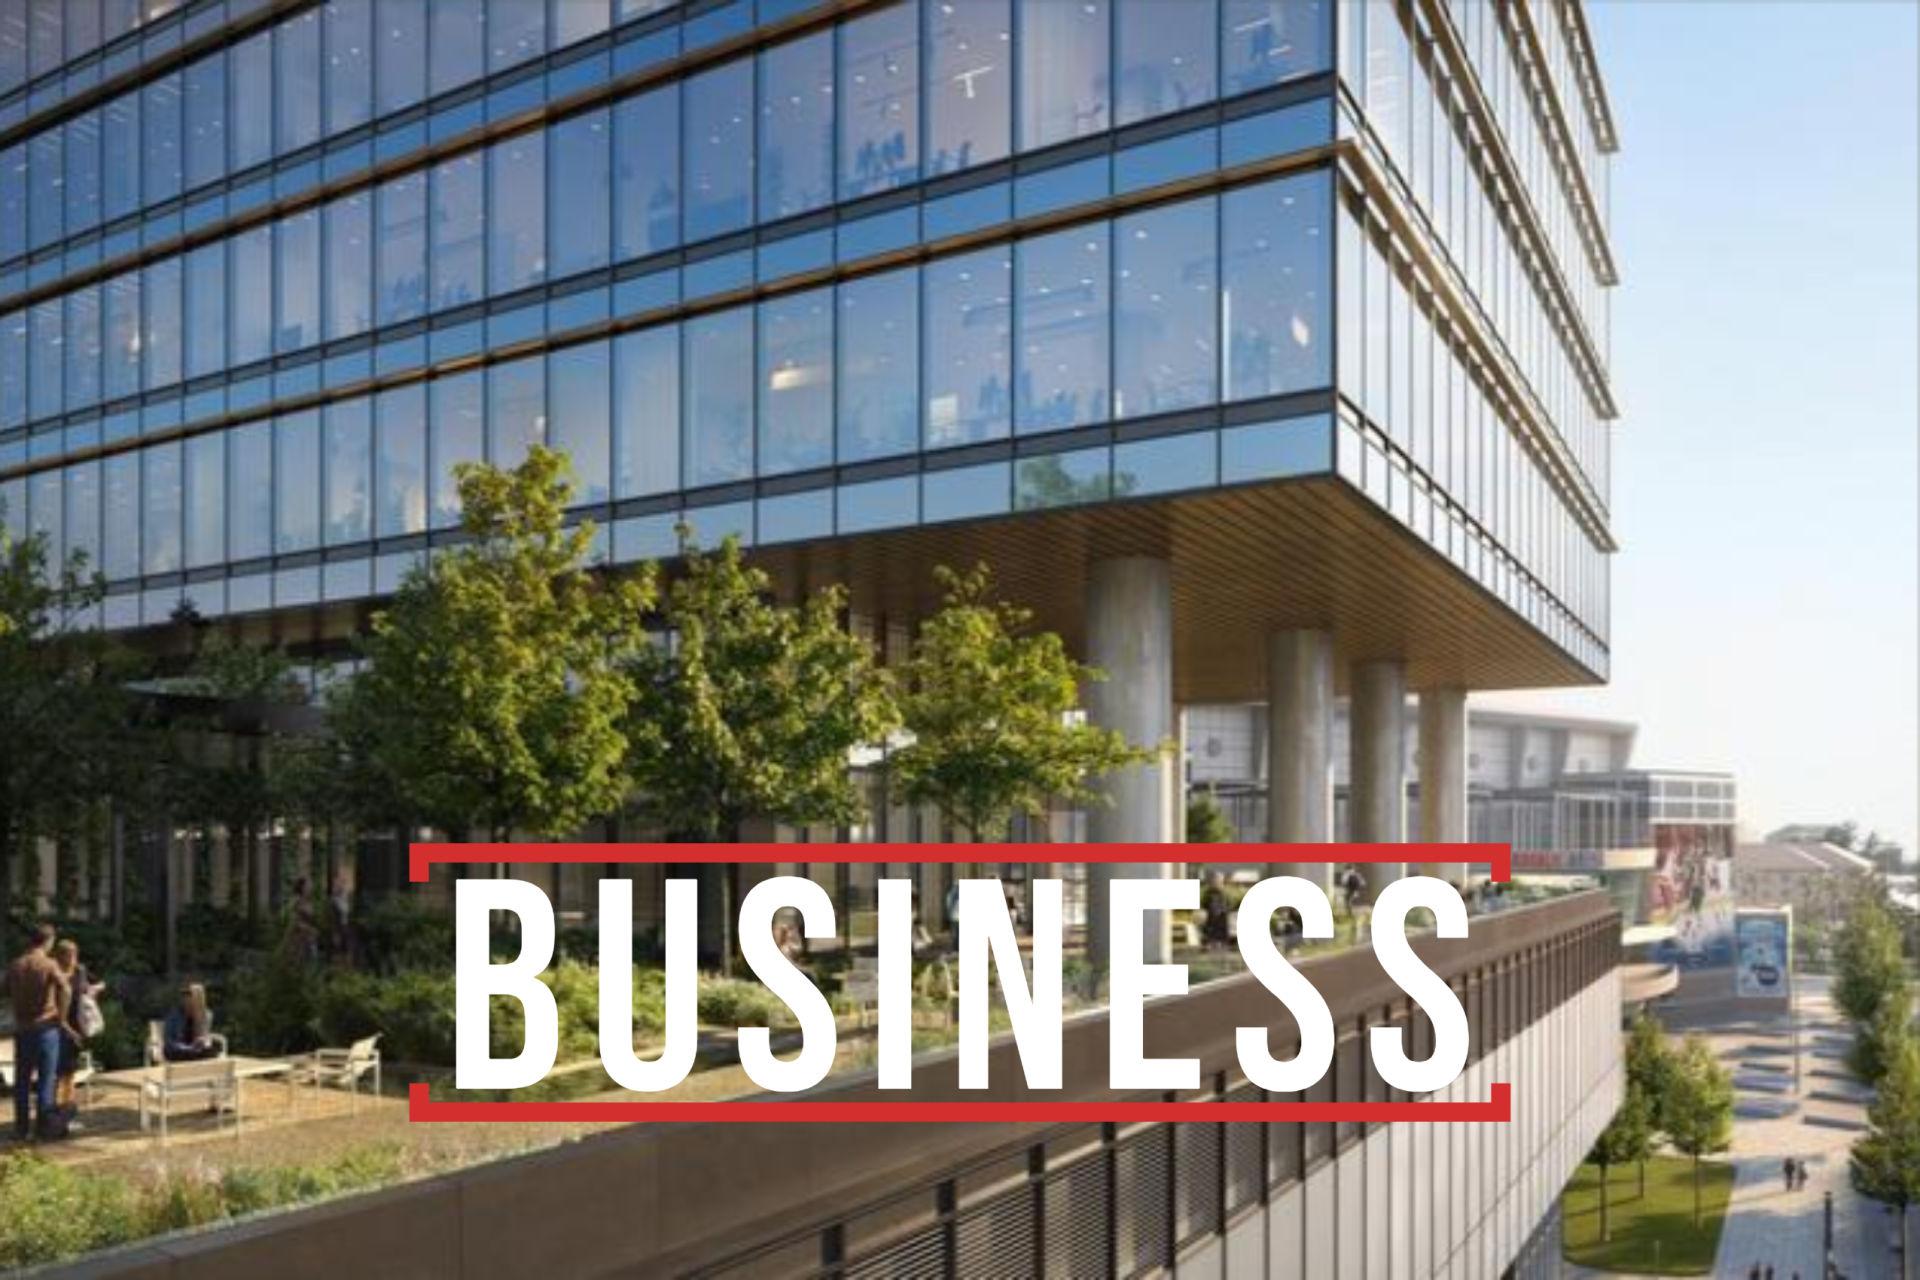 Businesses For Sale – Sarasota